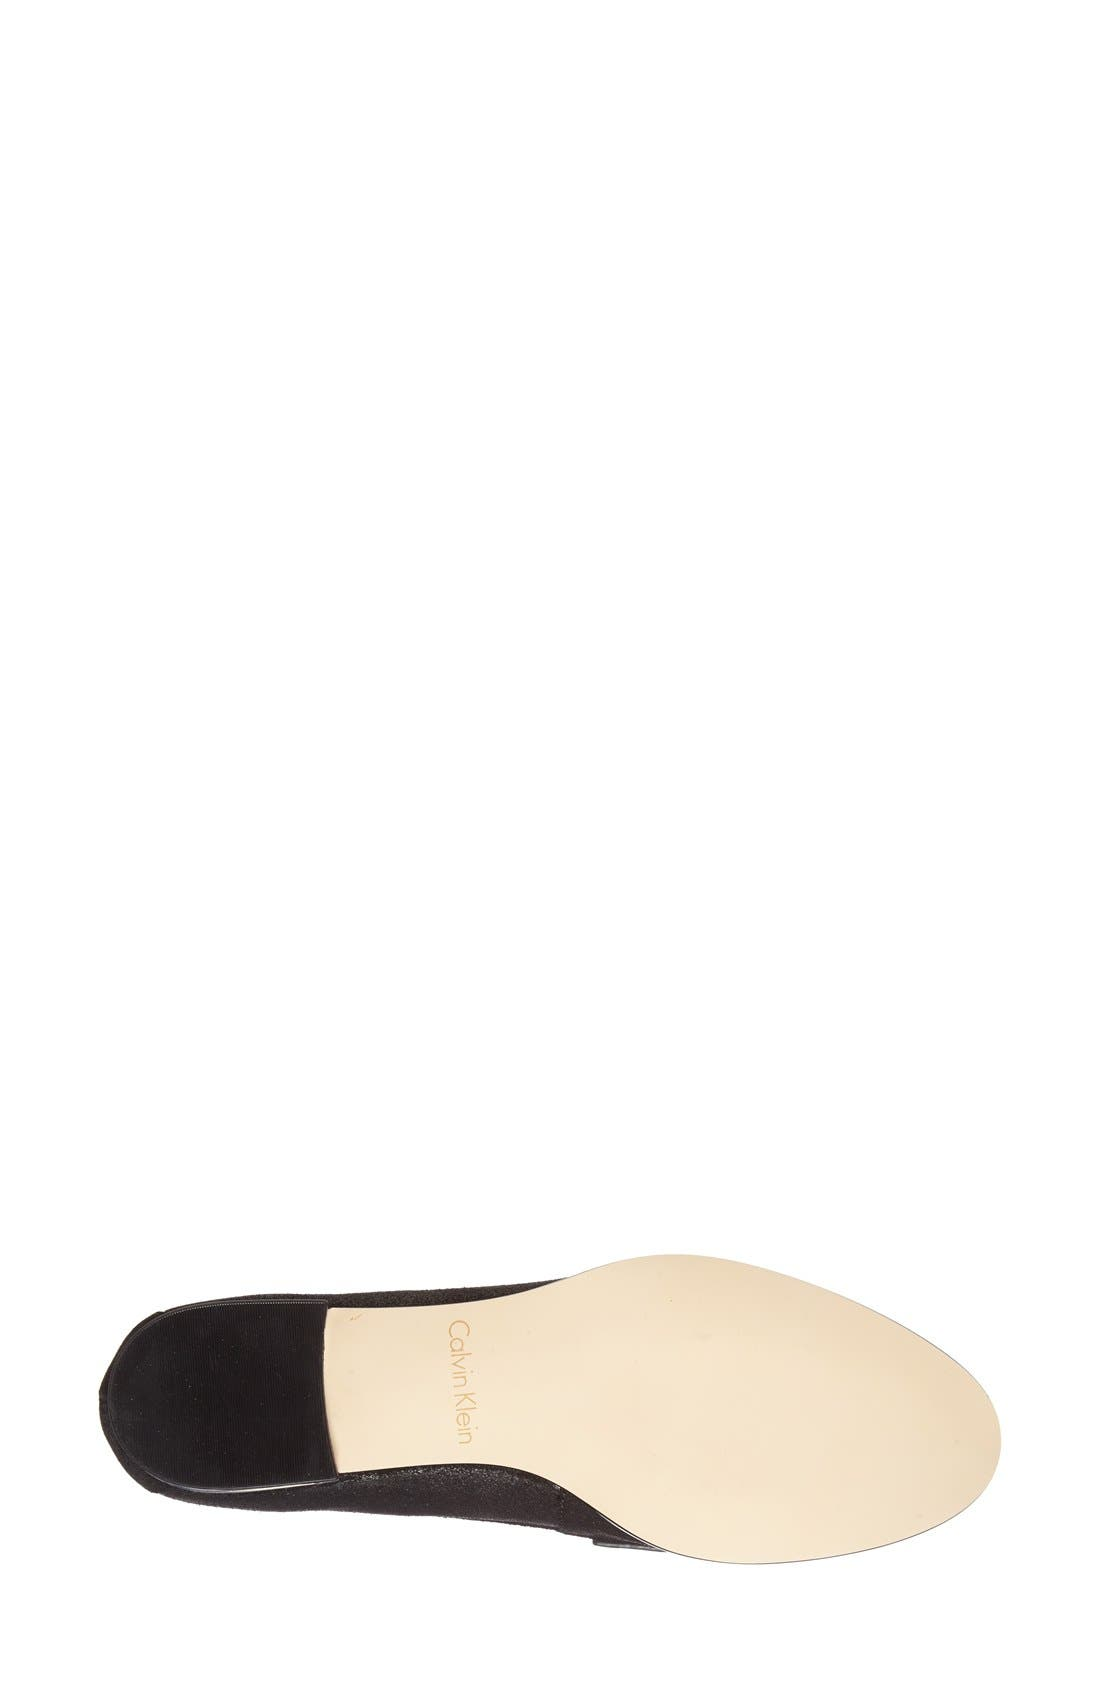 Alternate Image 4  - Calvin Klein 'Celia' Penny Loafer (Women)